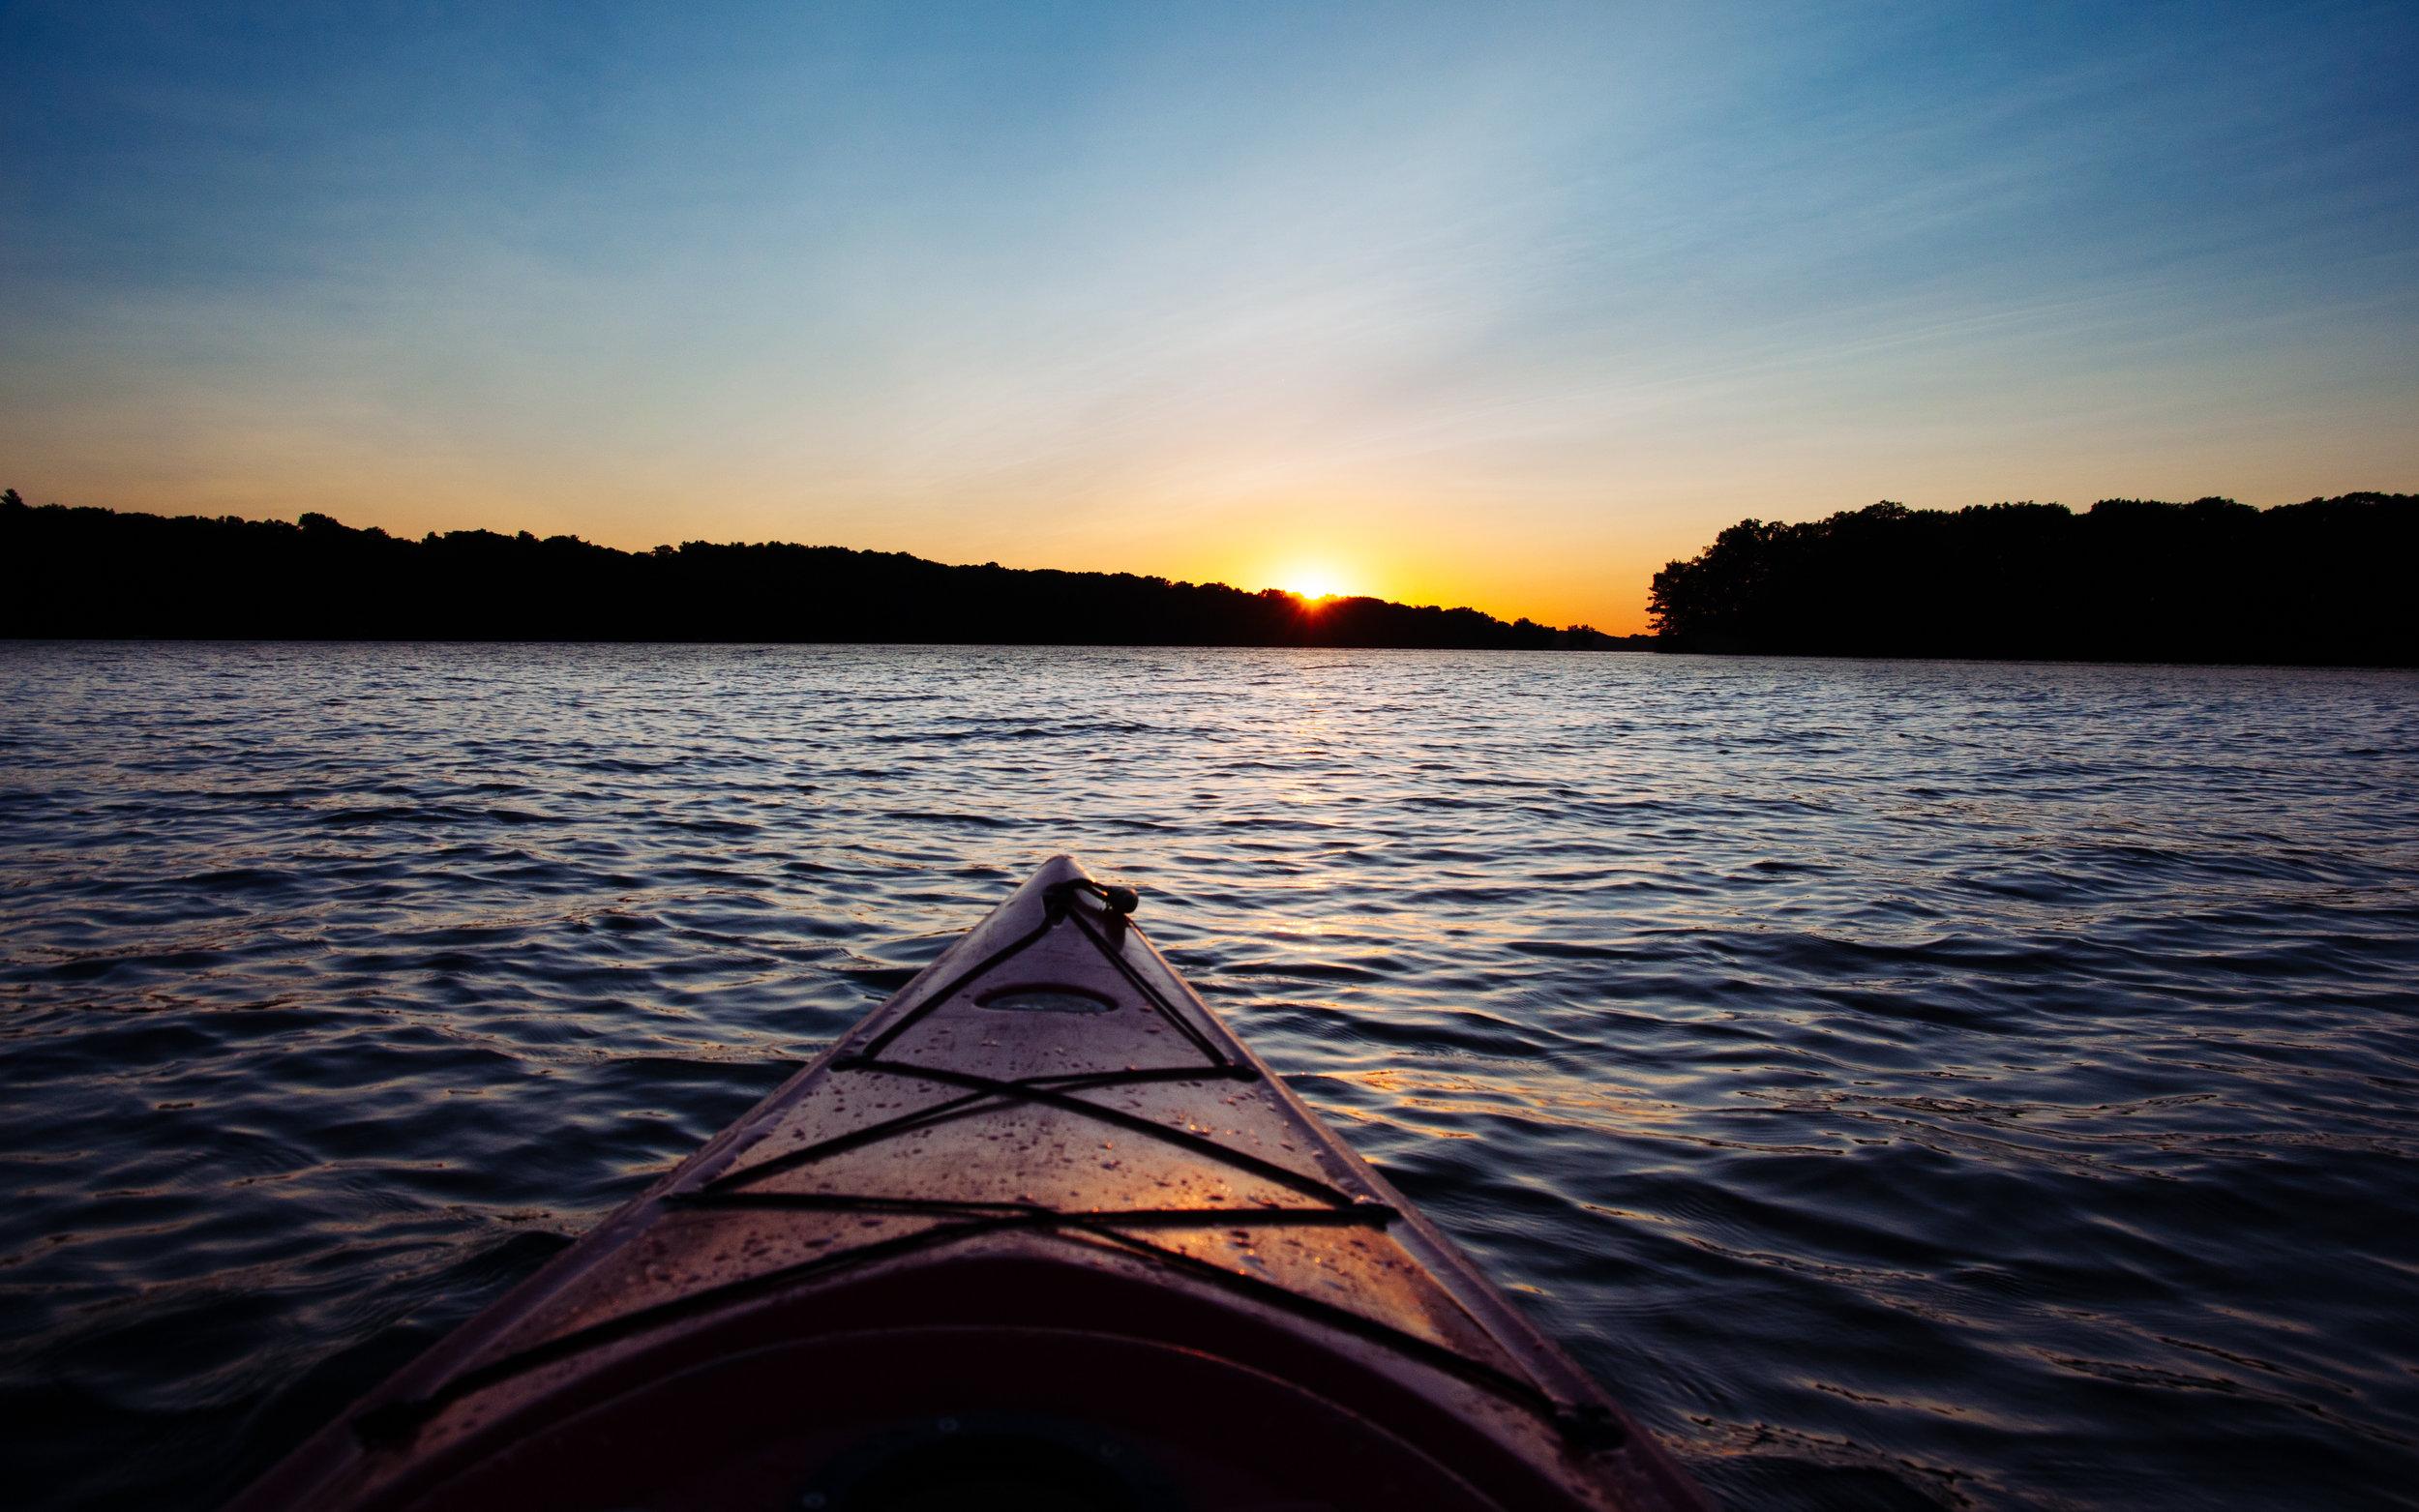 Lake Allegan, Michigan / 2017